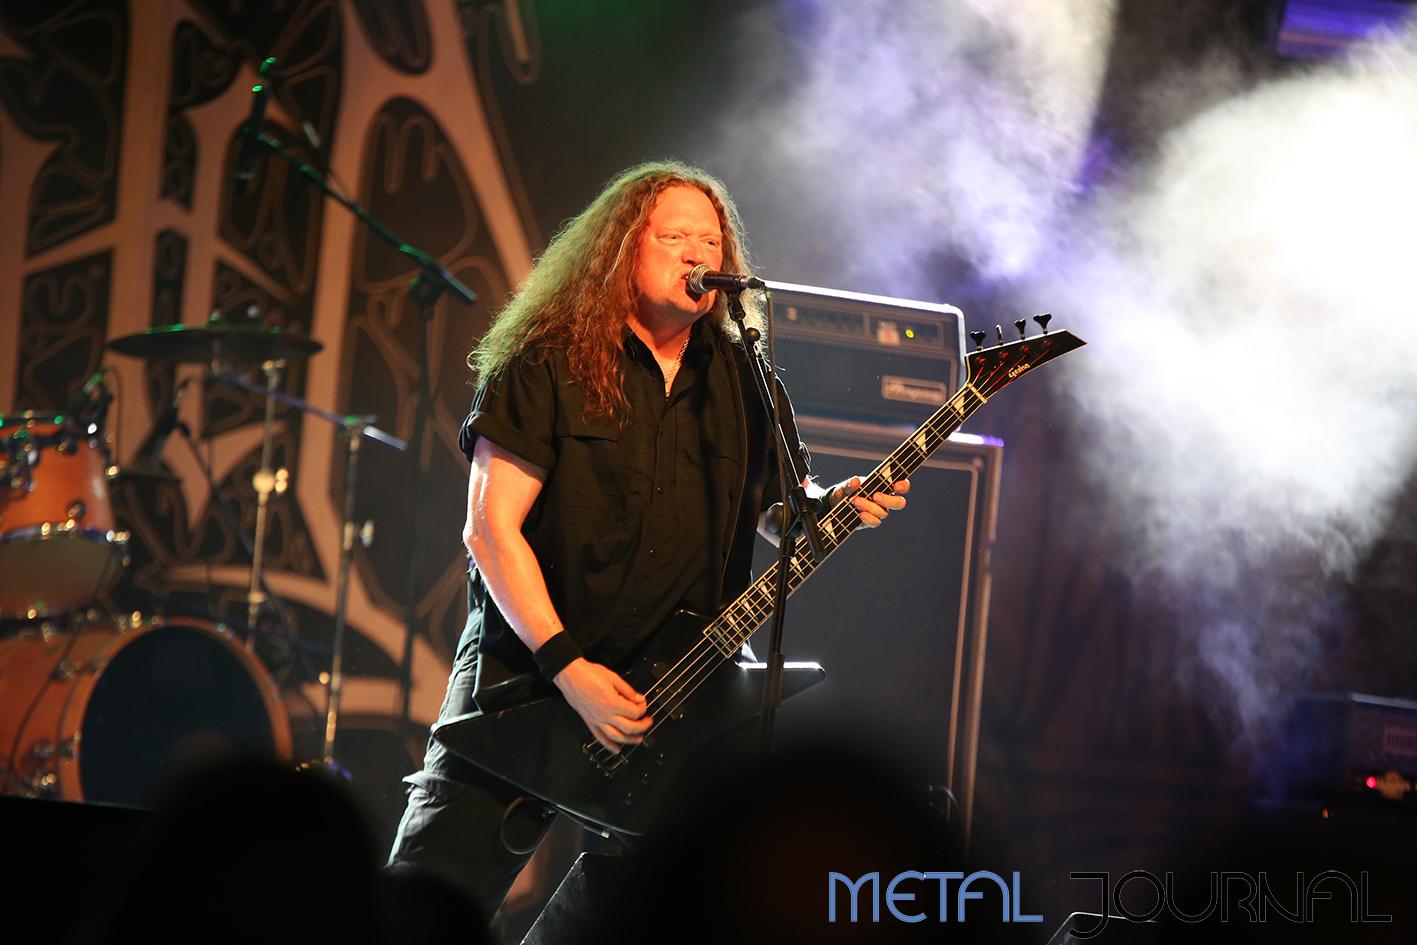 unleashed - leyendas del rock 2019 metal journal pic 5